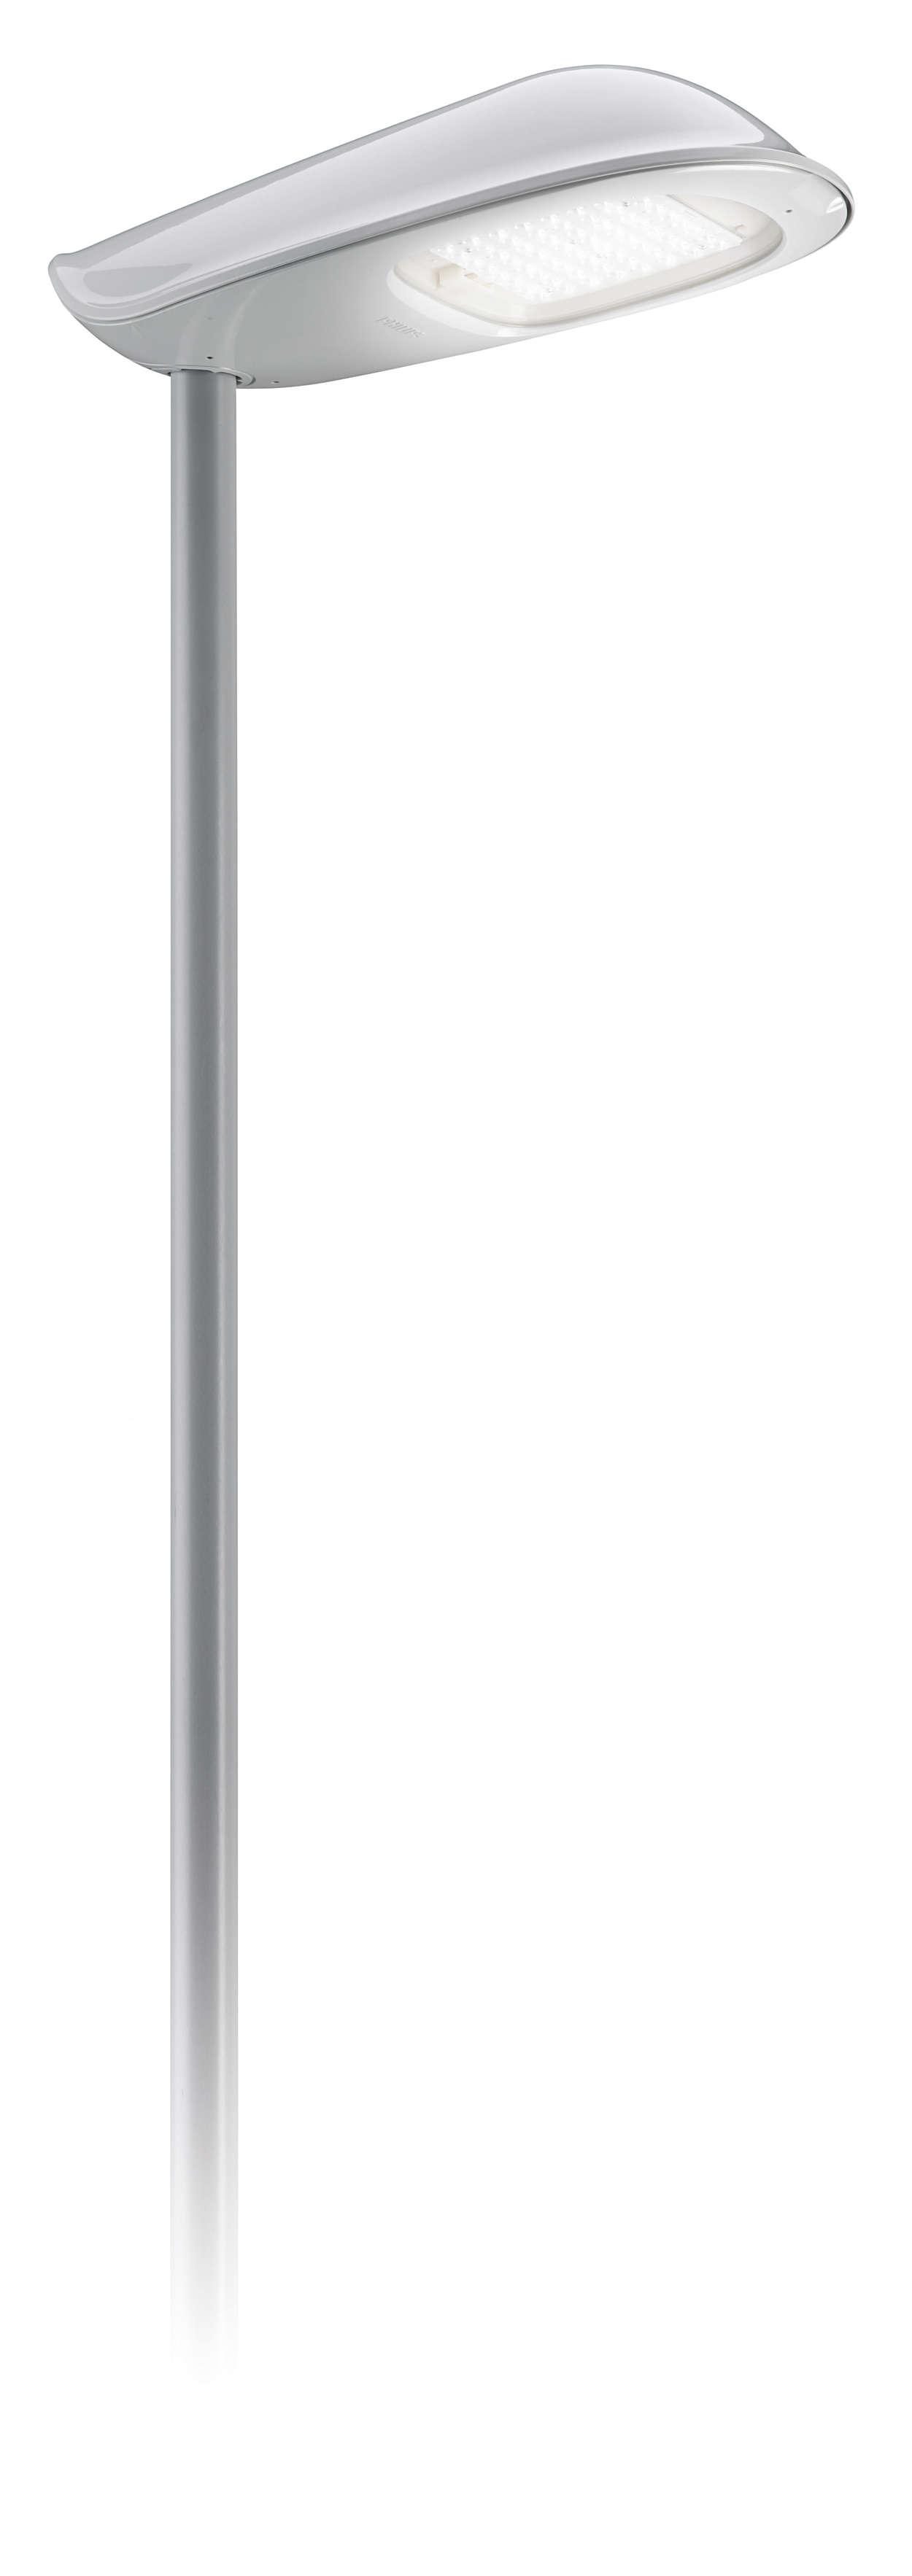 Iridium² LED mittlere Bauform